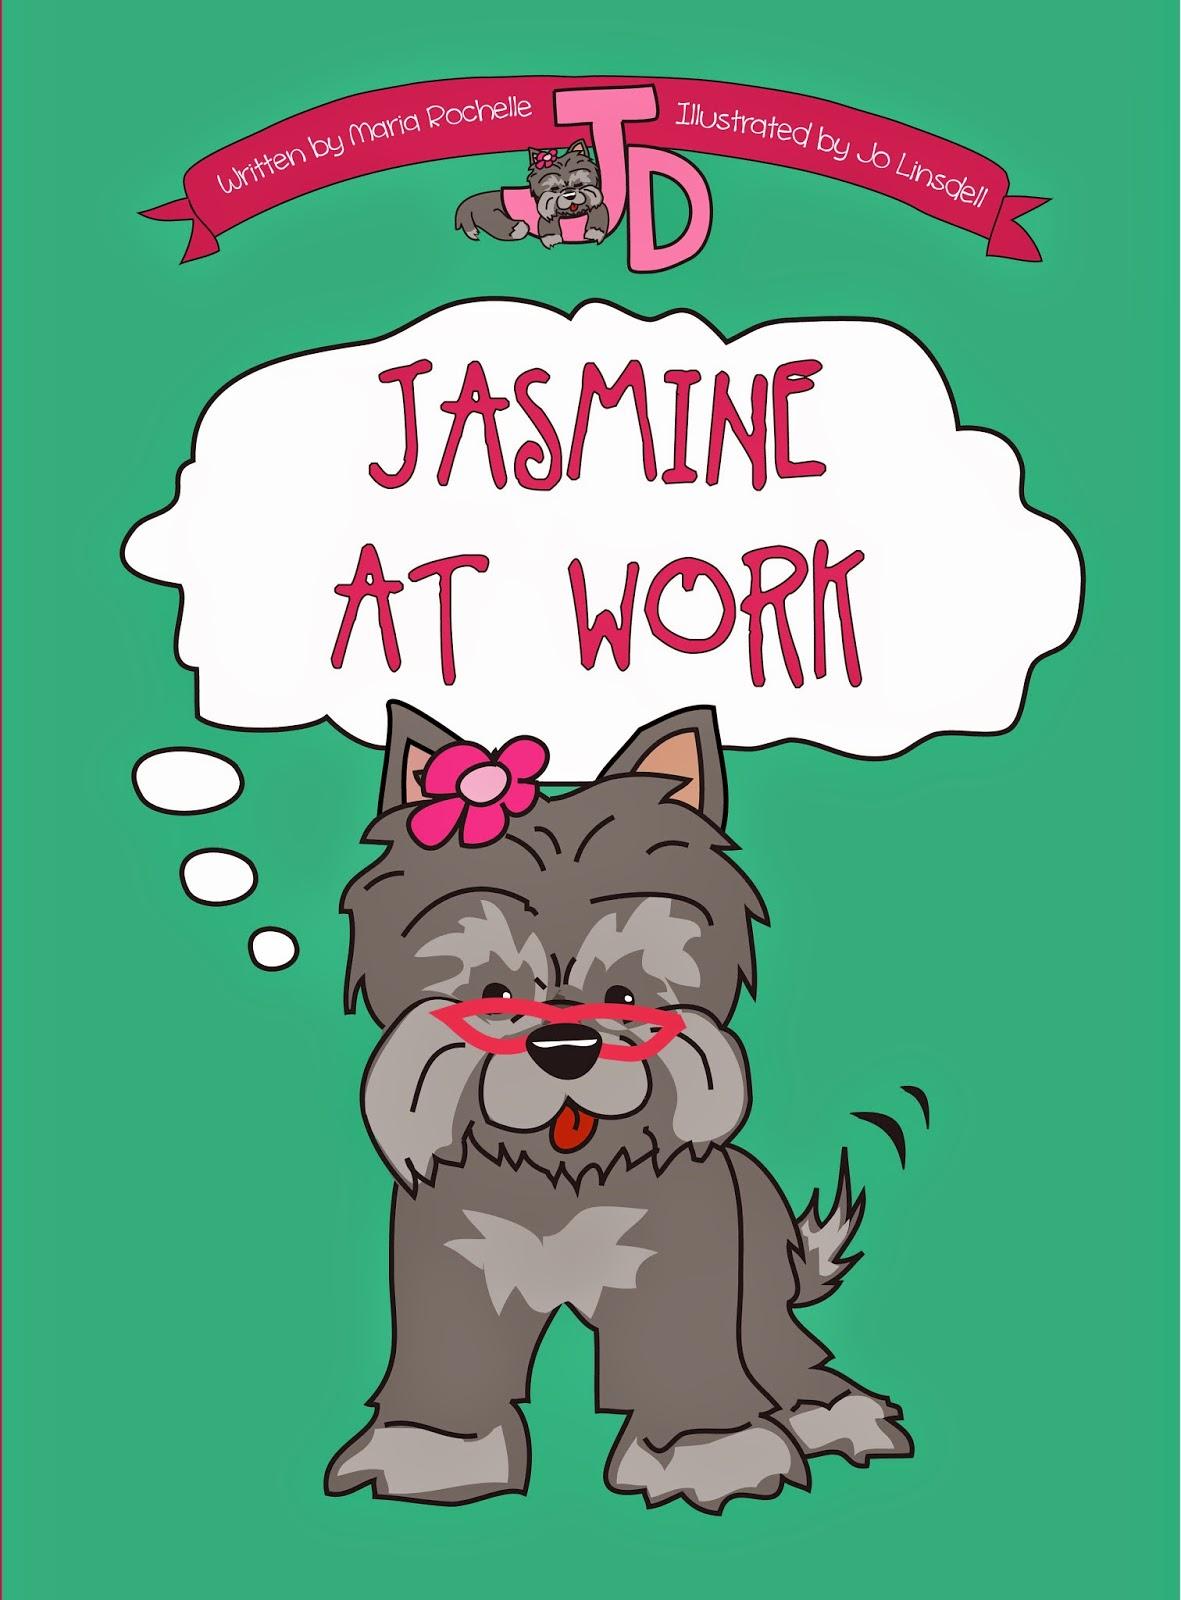 Jasmine at Work